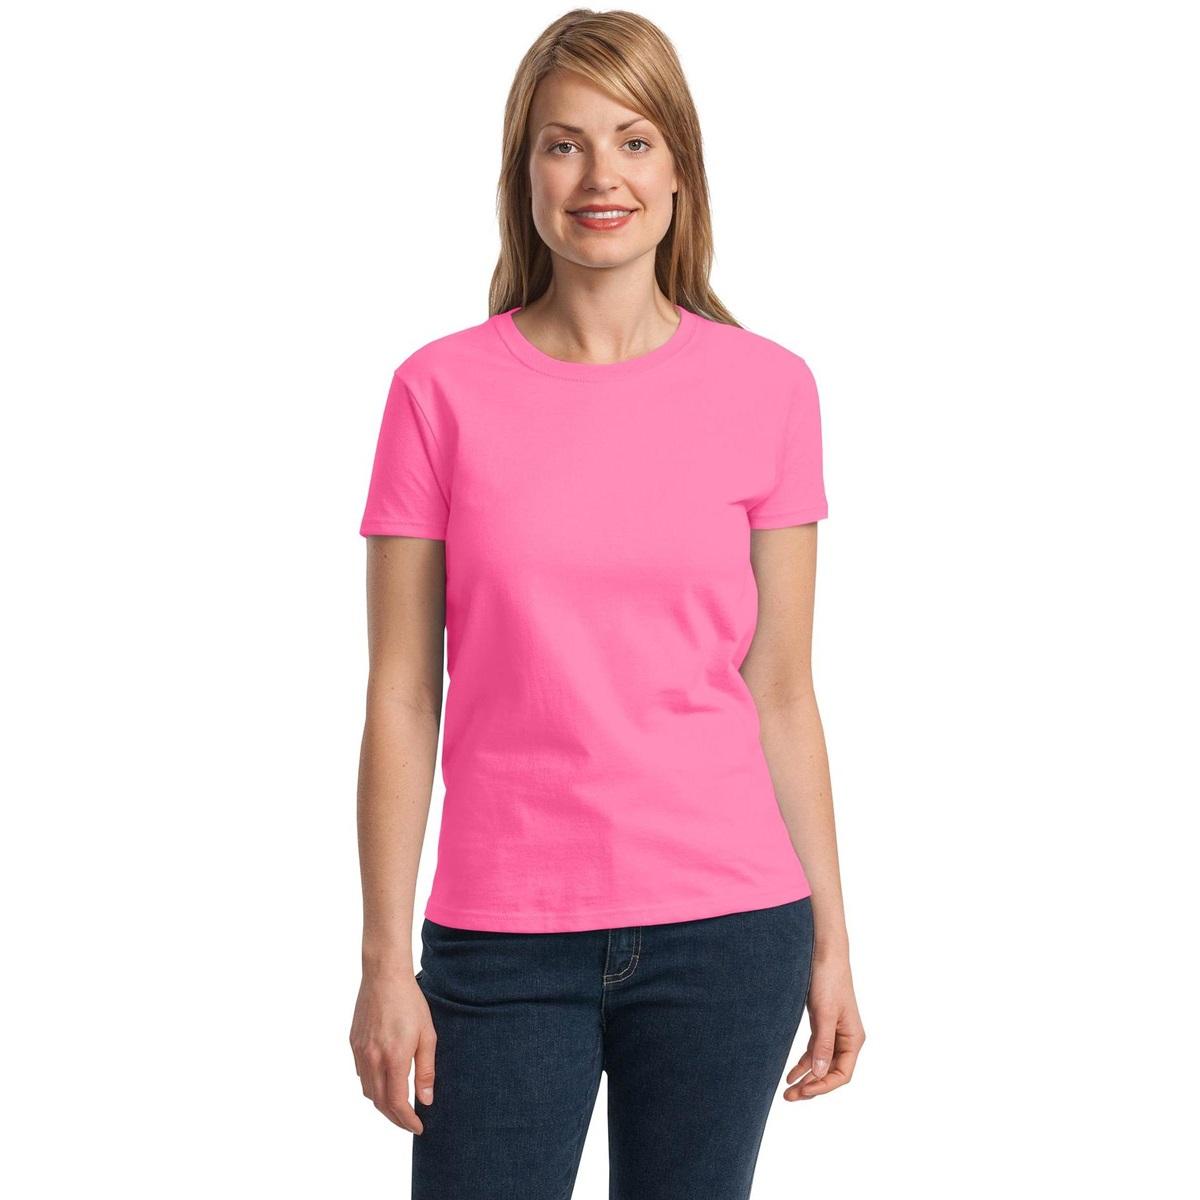 Gildan 2000l women 39 s ultra cotton t shirt safety pink for Pink ladies tee shirts